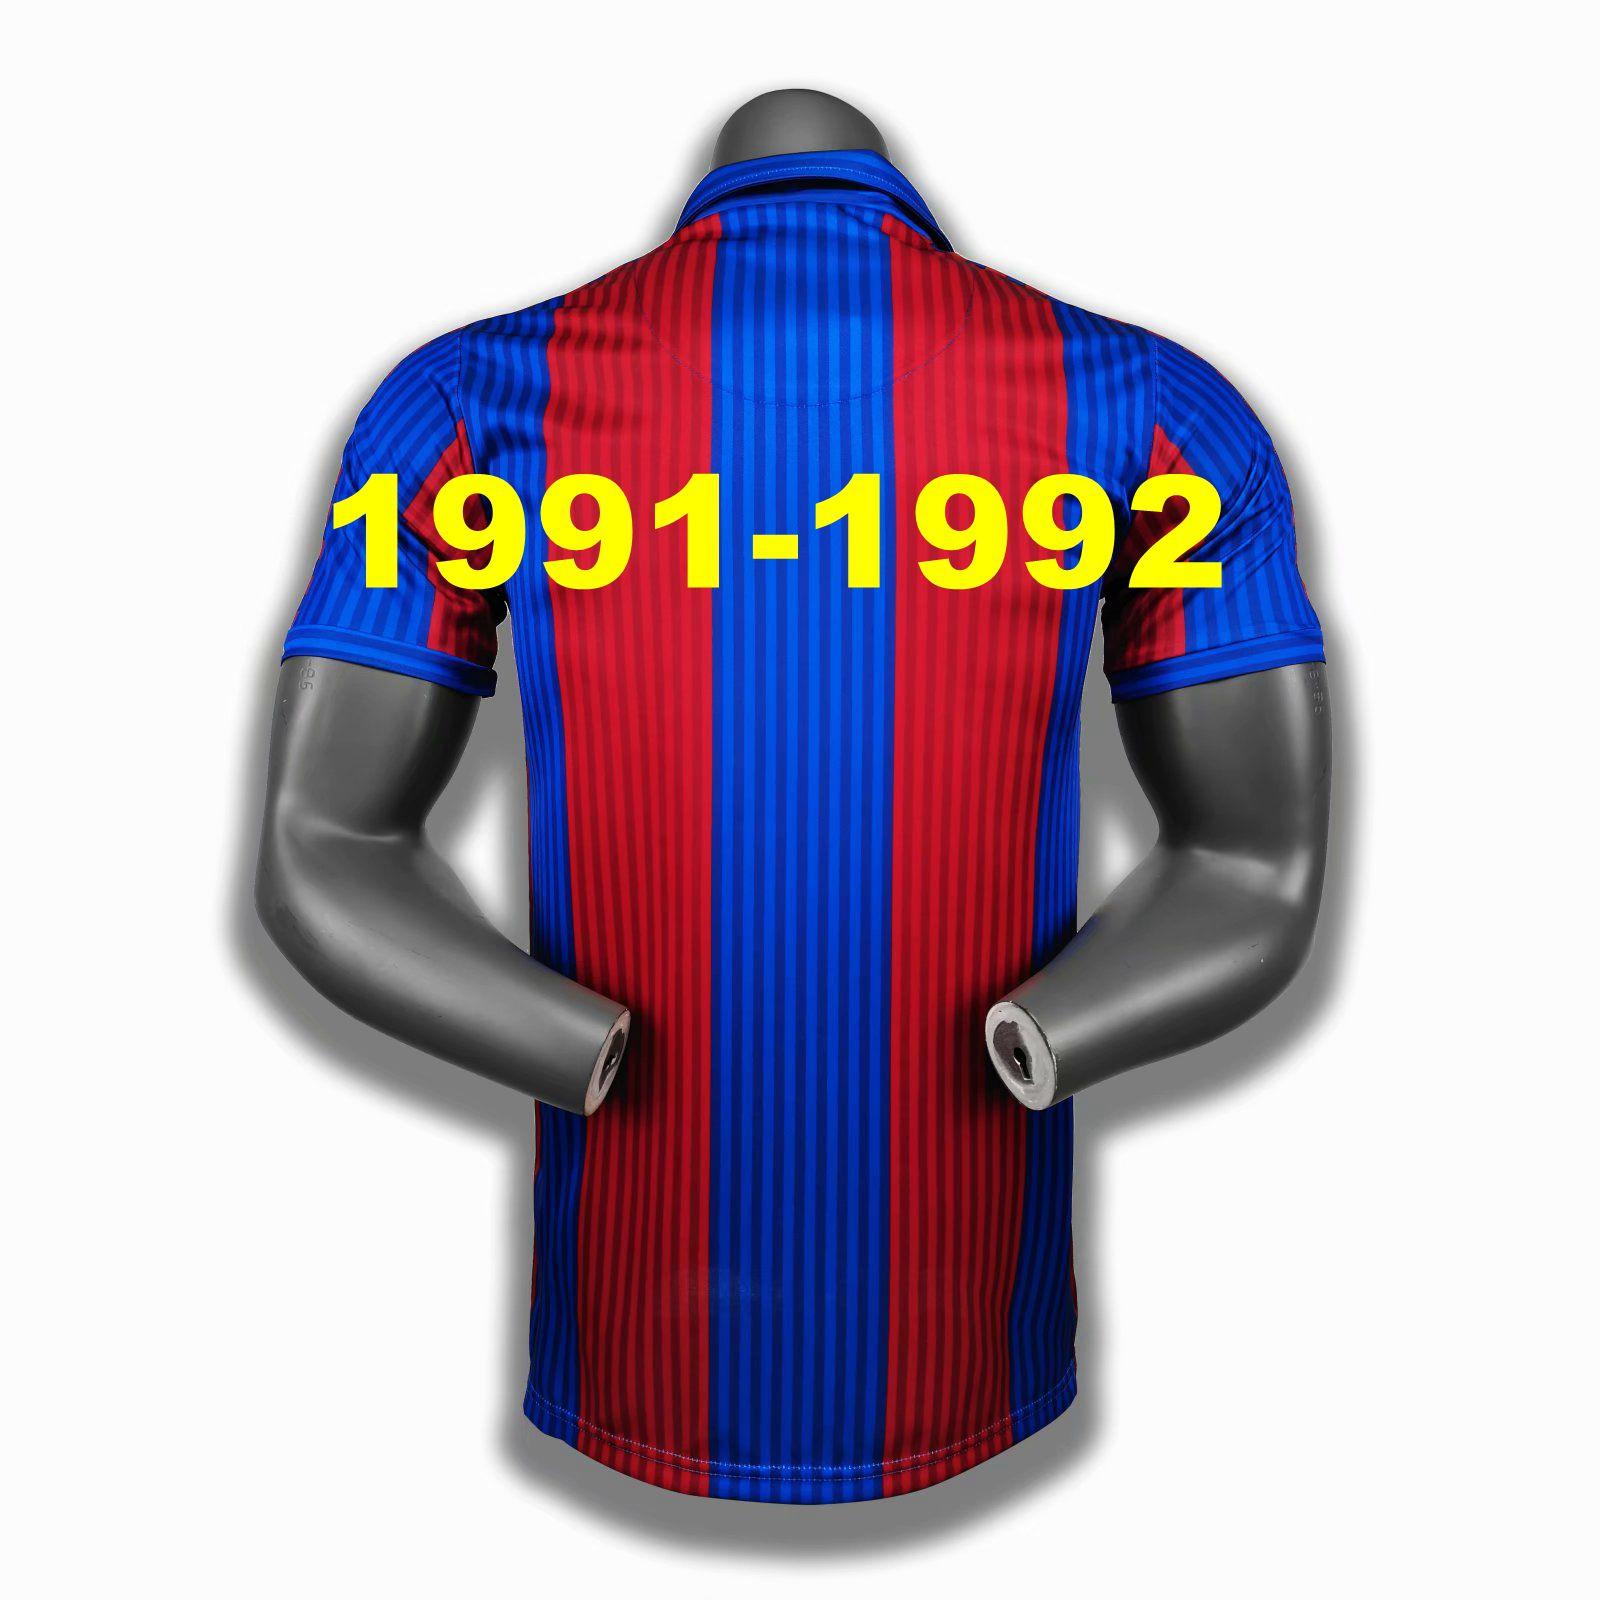 Jerseys de fútbol Retro, Camiseta de fútbol de casa, Messi 10, uniforme,...